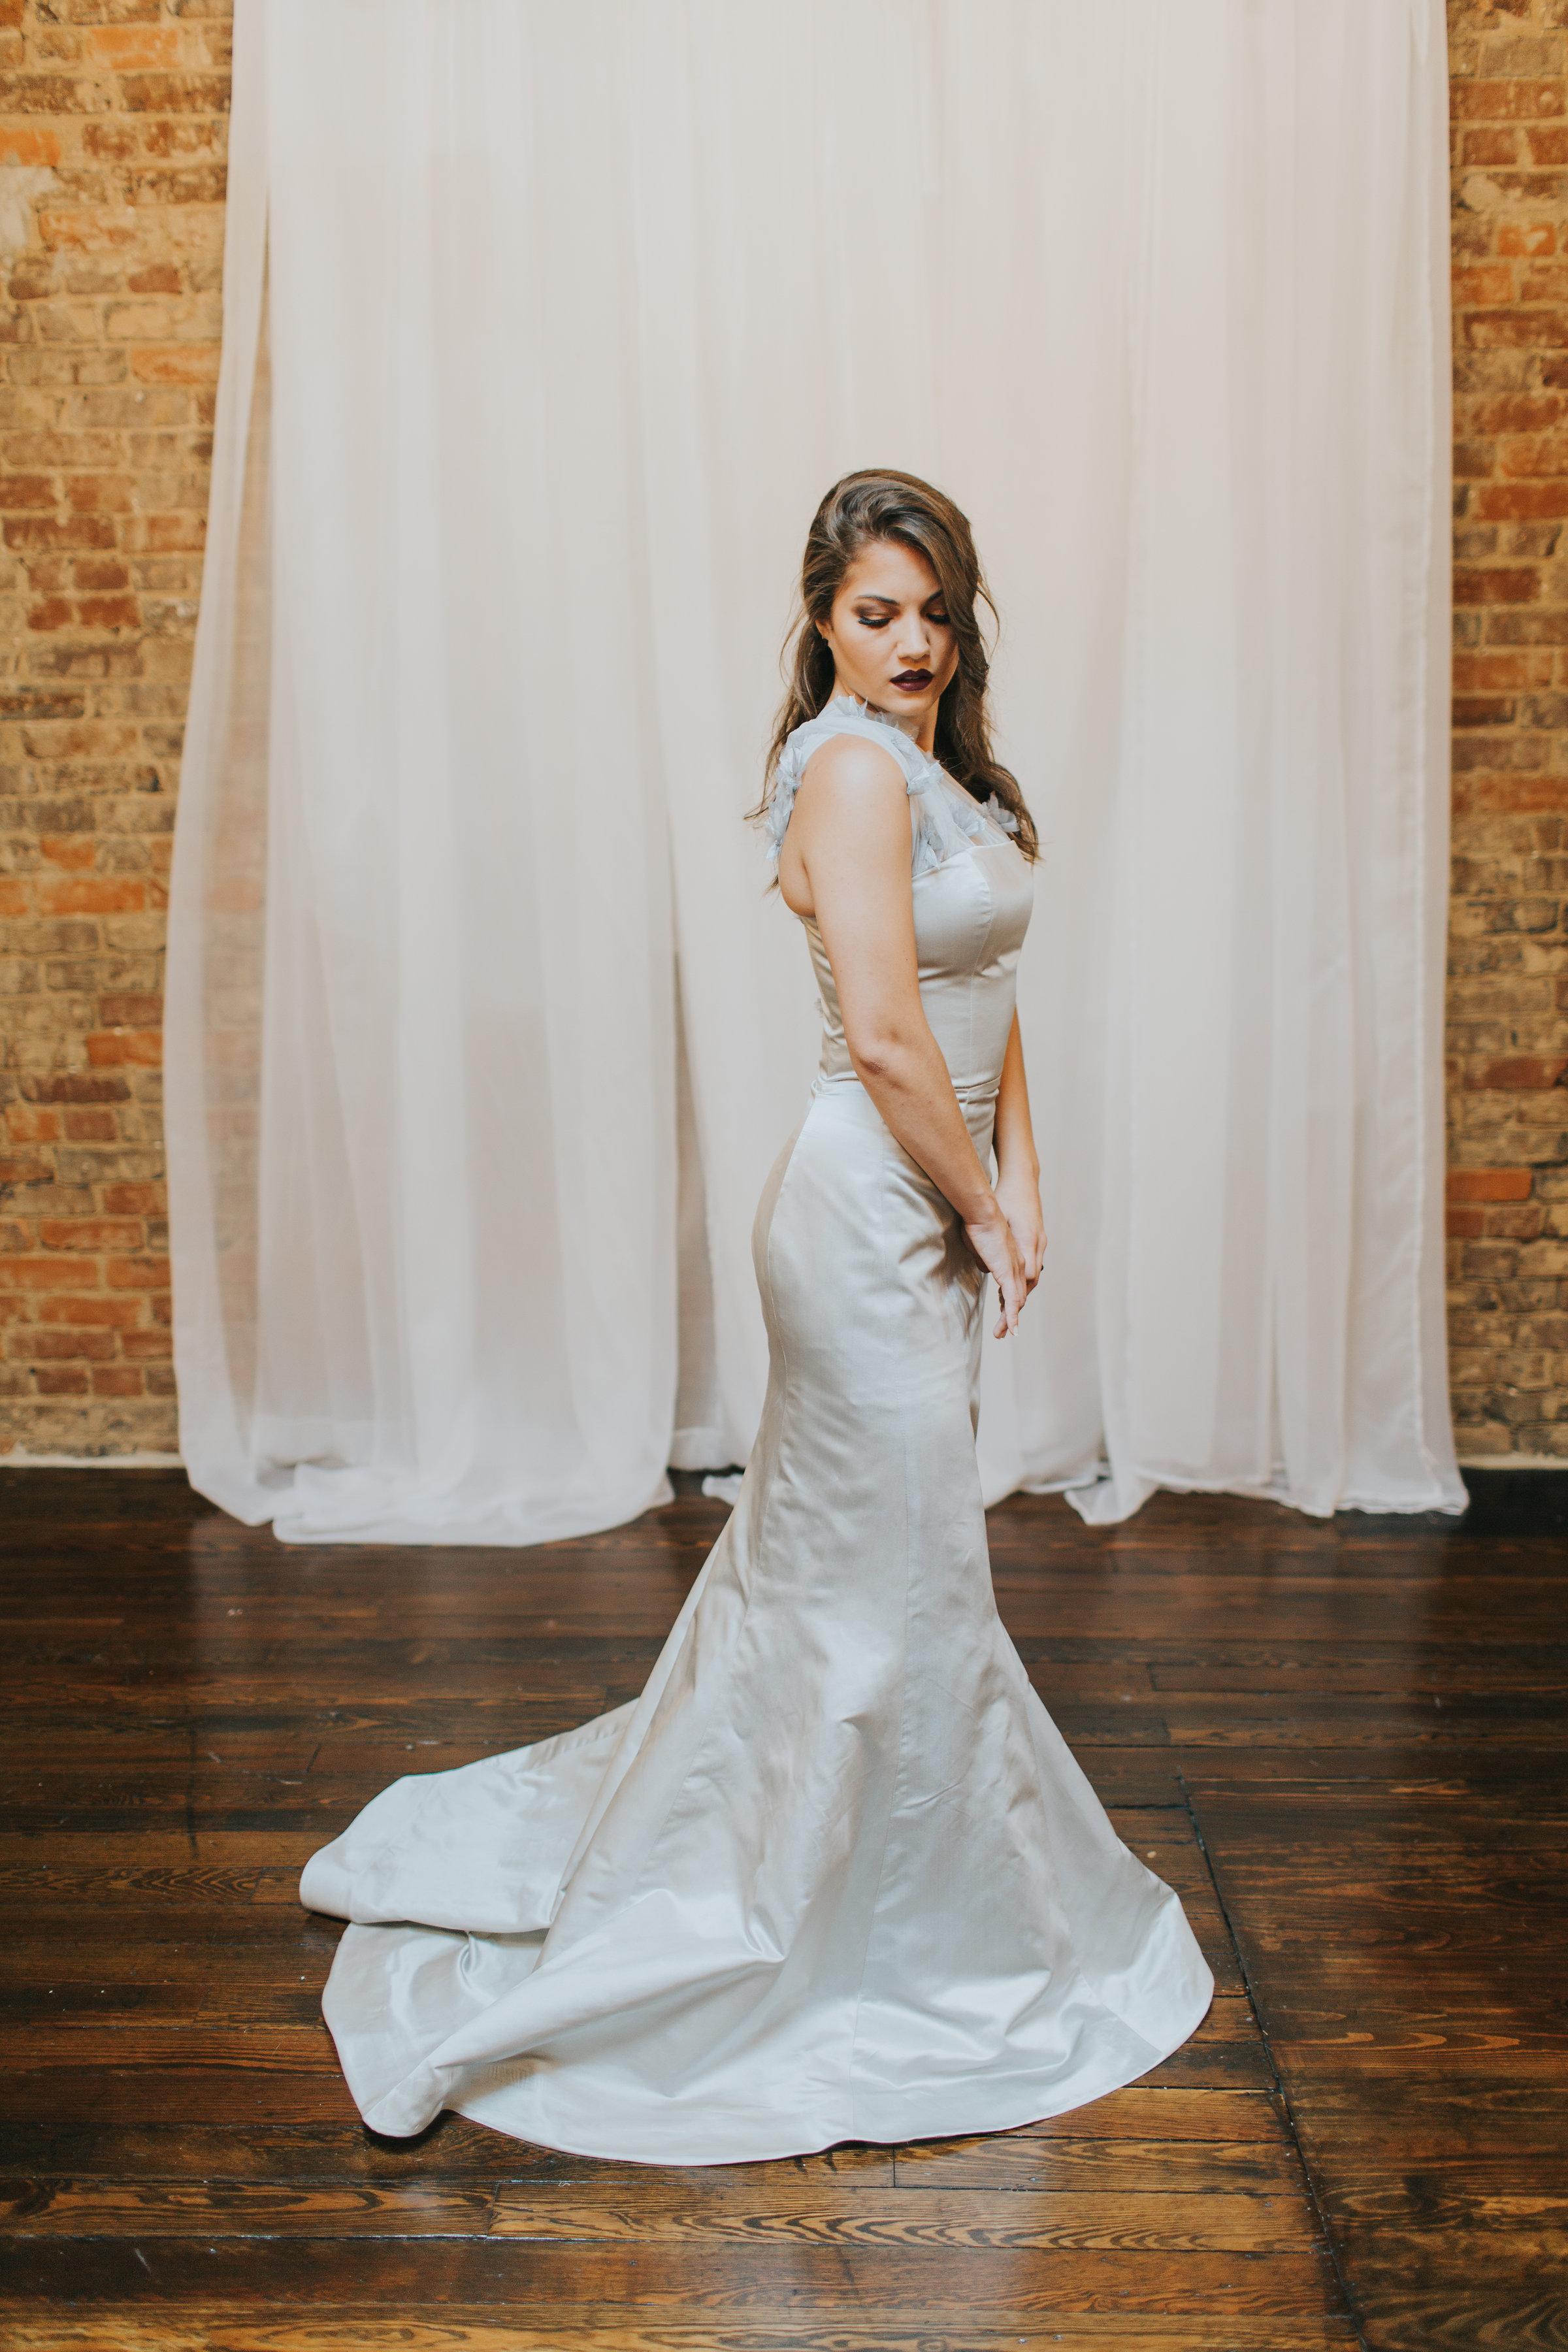 Brides-13.jpg